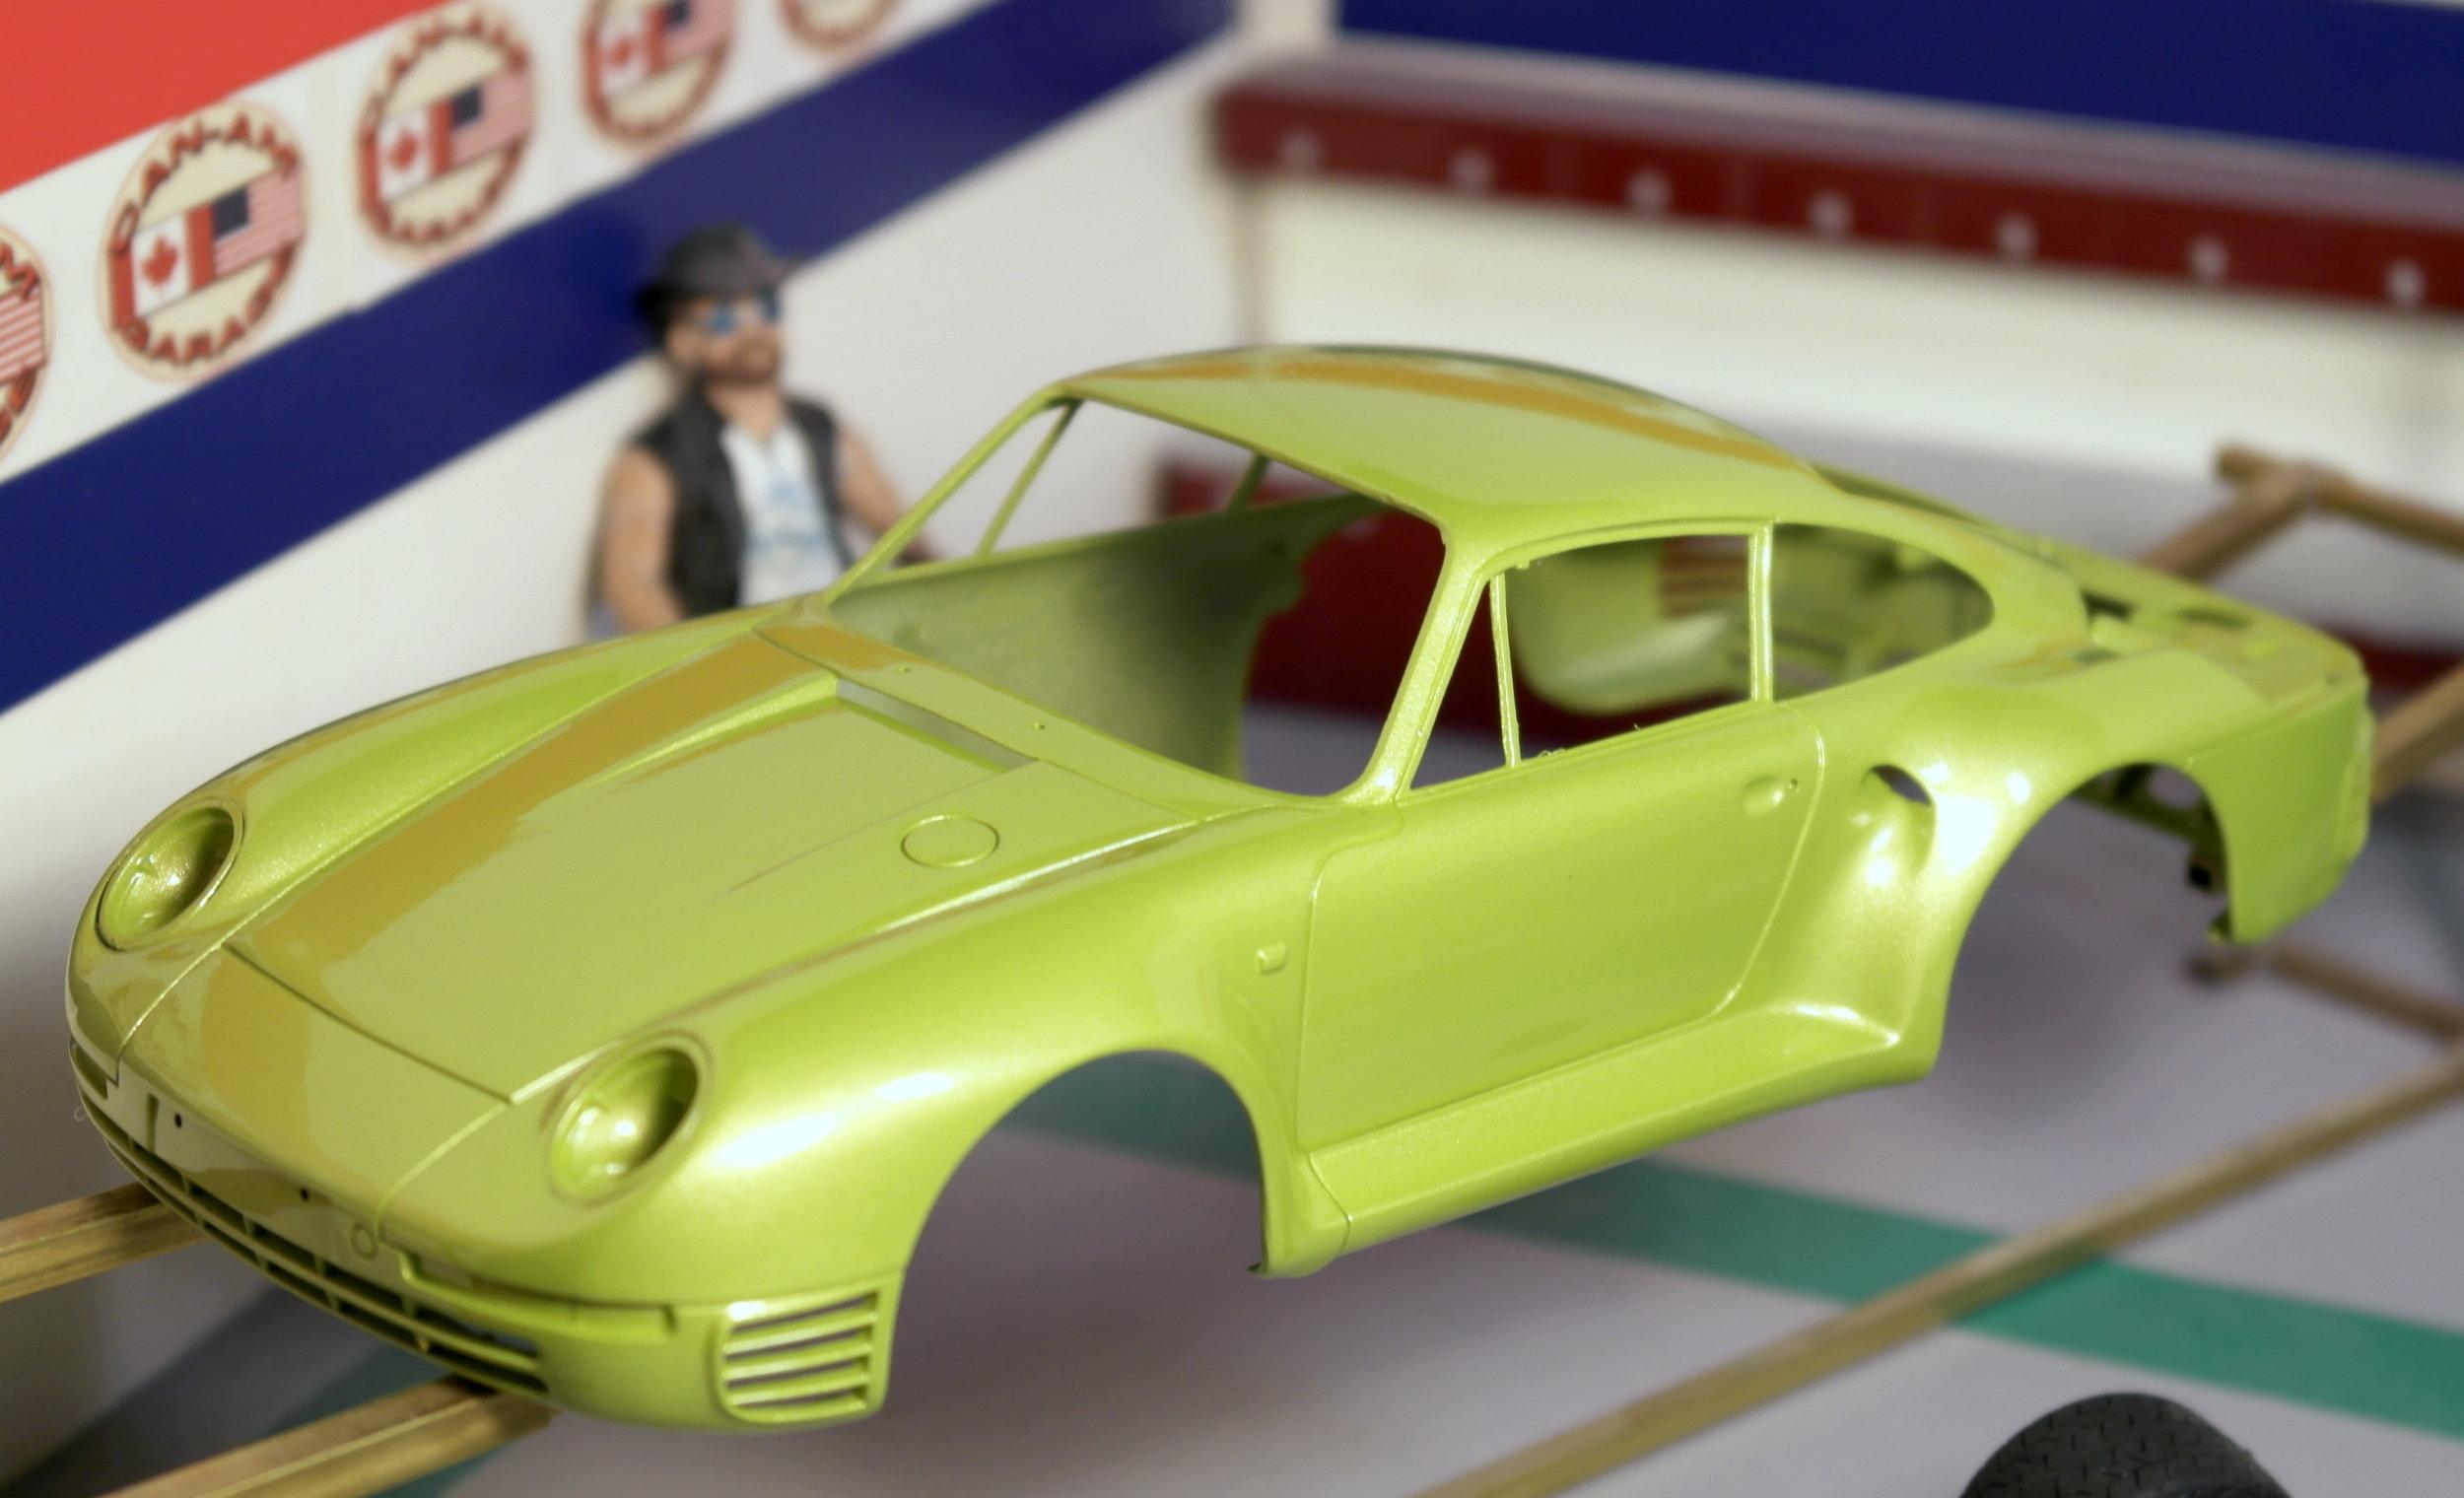 John's Peridot Green Porsche 959